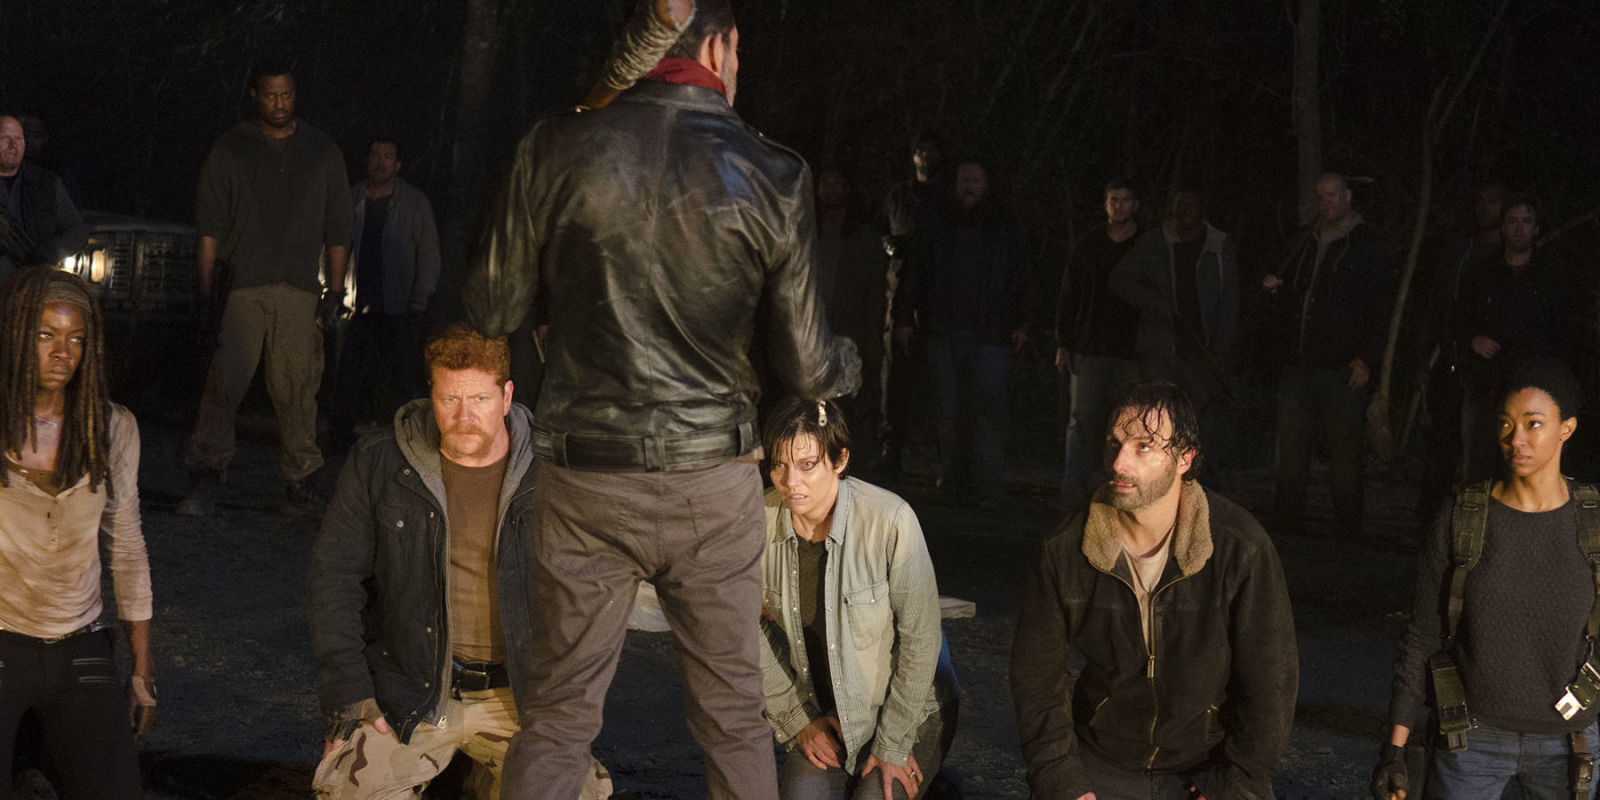 The Walking Dead: The Walking Dead Season 7 Premiere Features An Extra 6